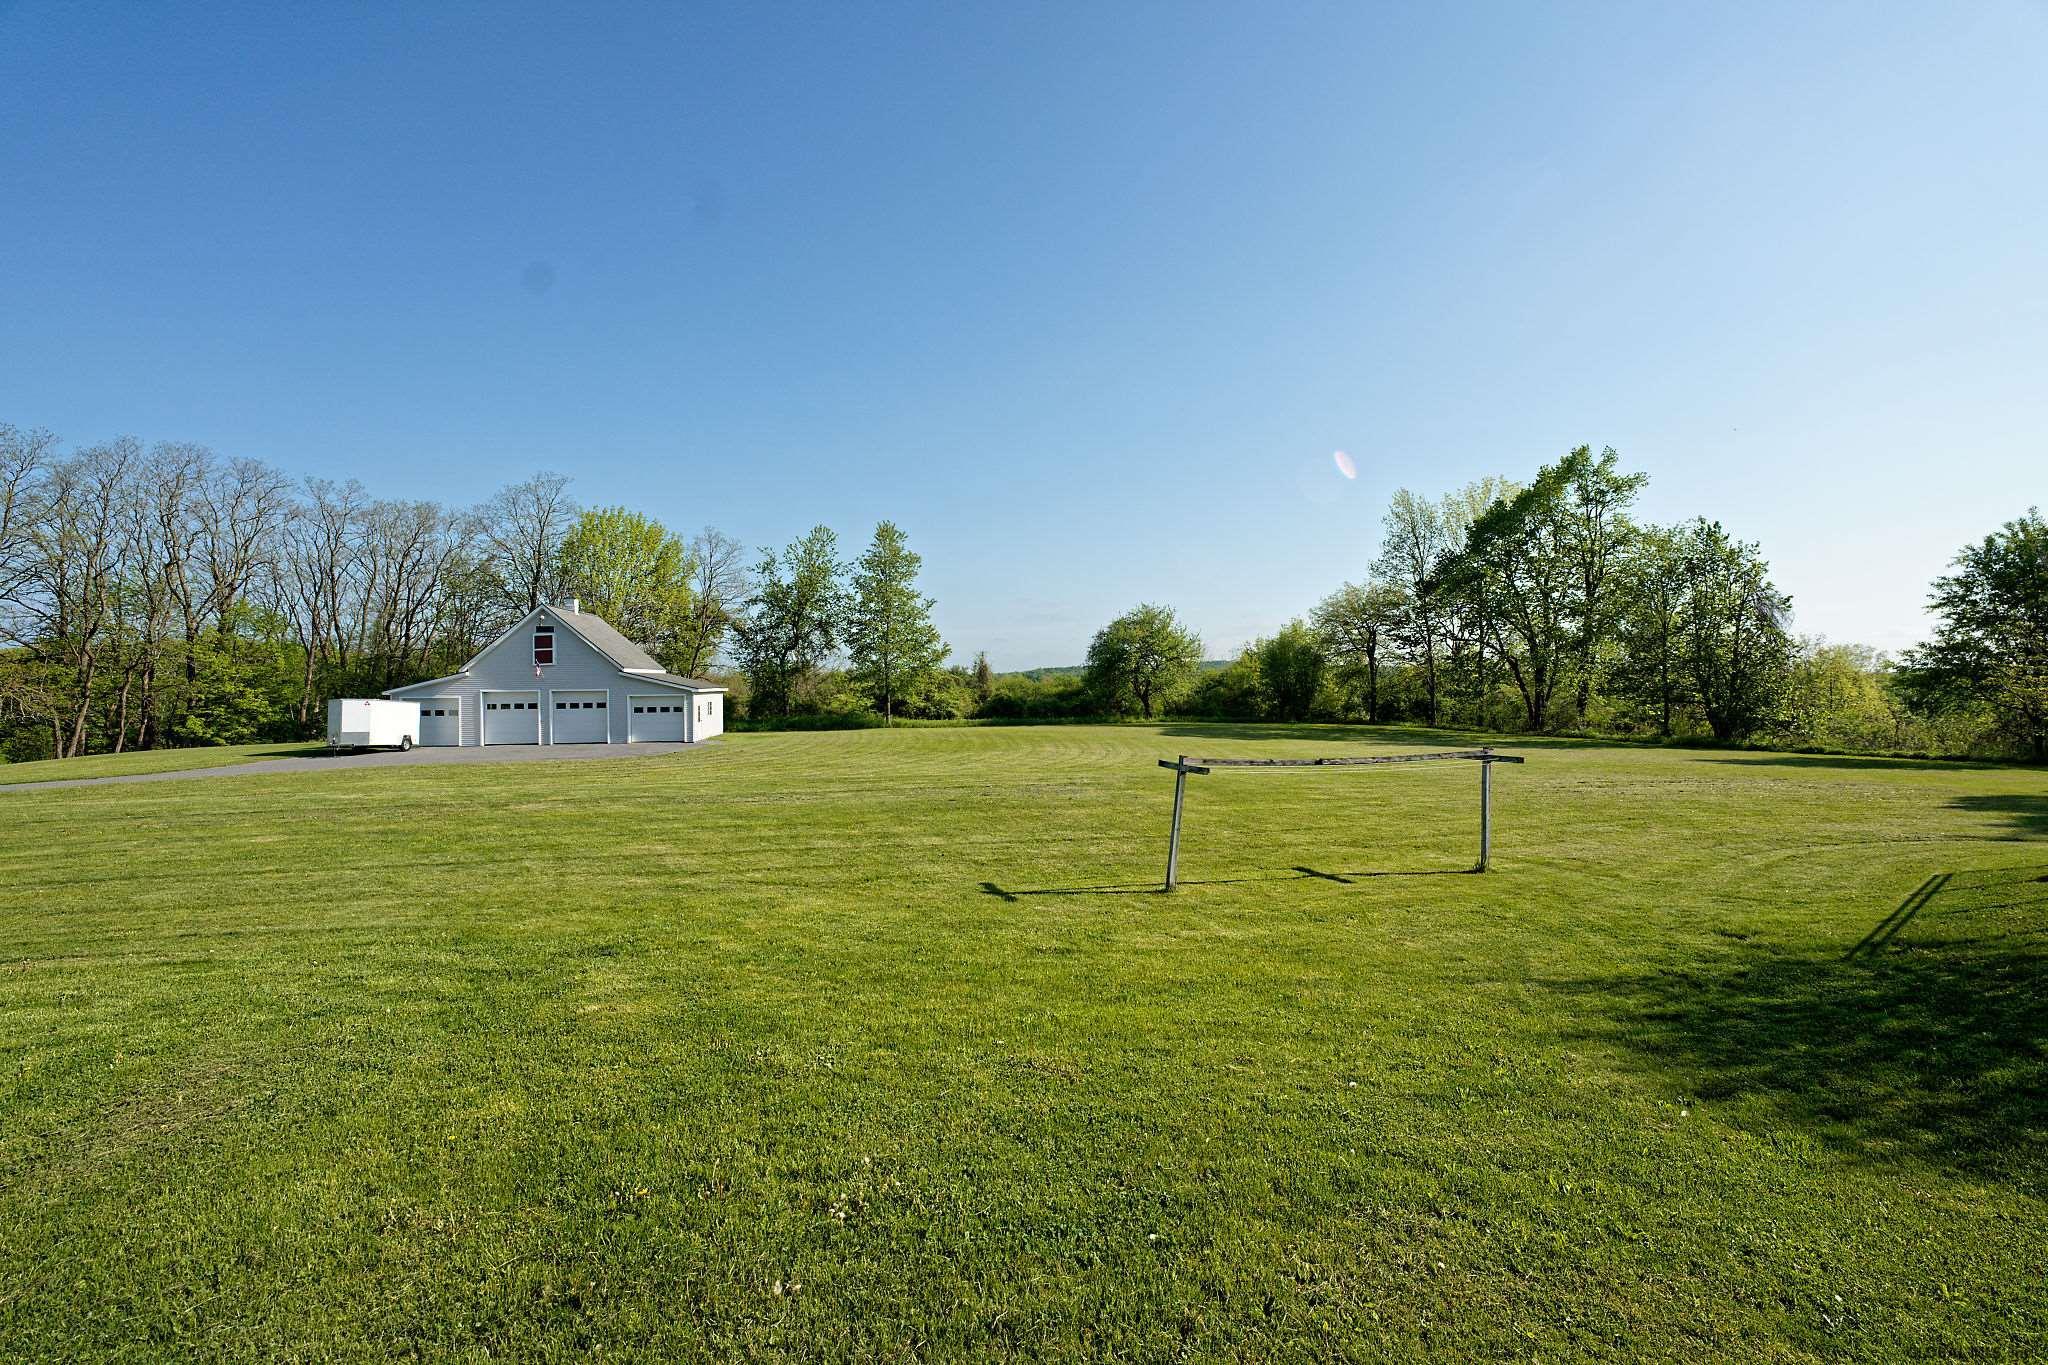 Glenville image 74